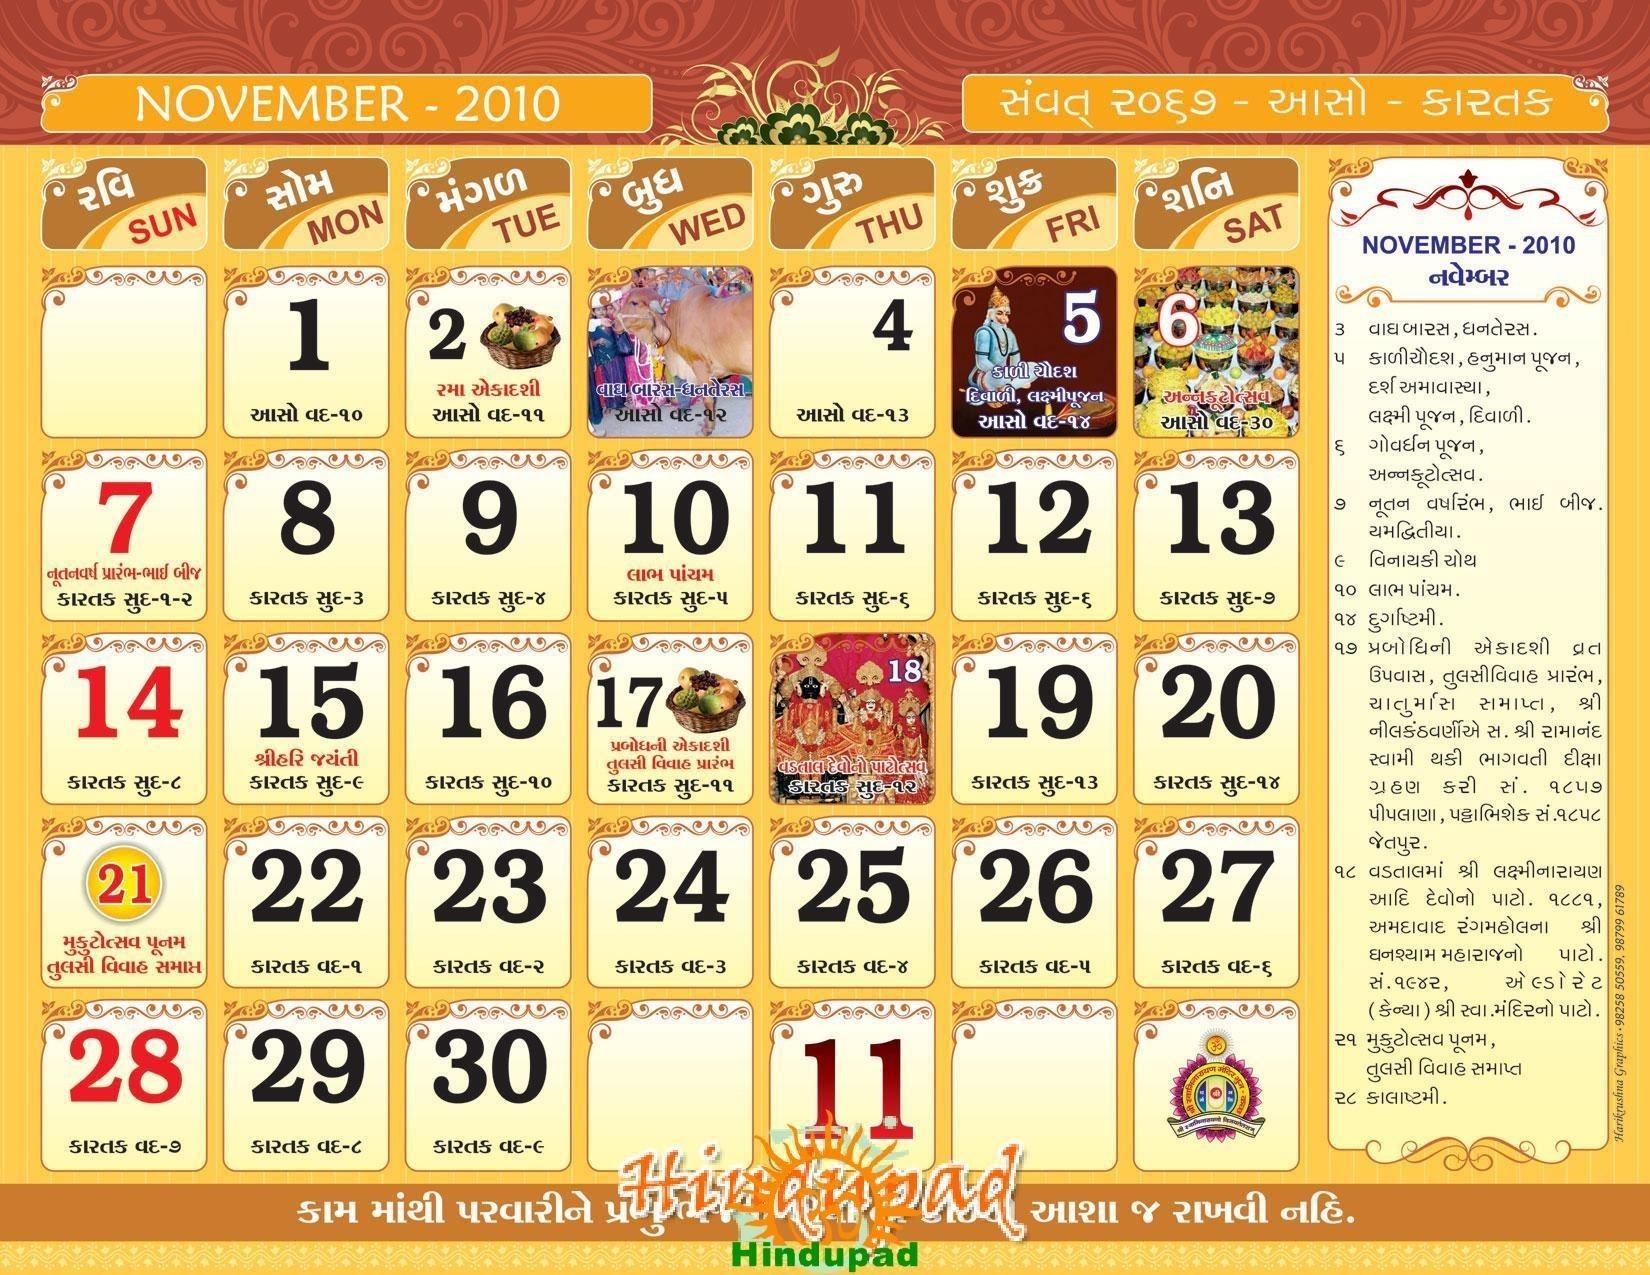 Gujarati Calendar November 2010 – Download Free Gujarati  Hindu Calendar 2021 With Tithi